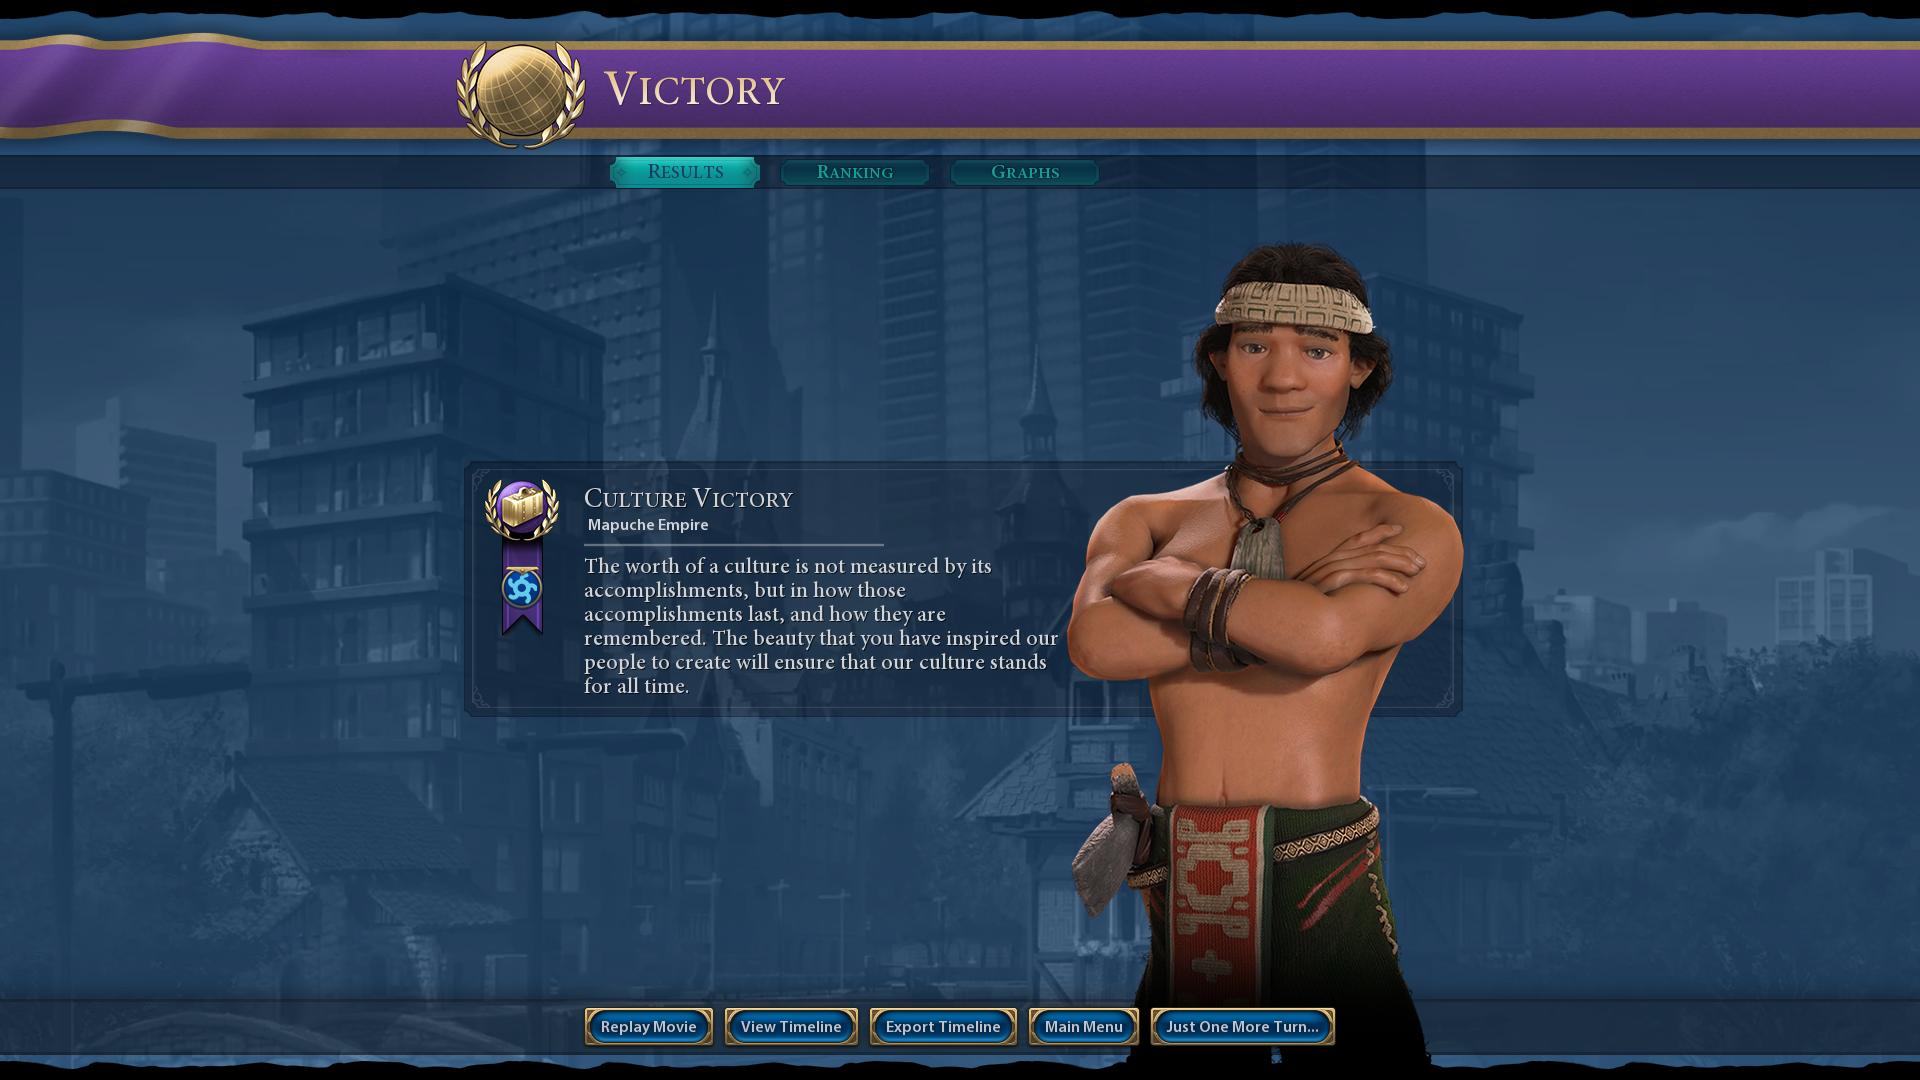 18-240-CV Victory Screen.png